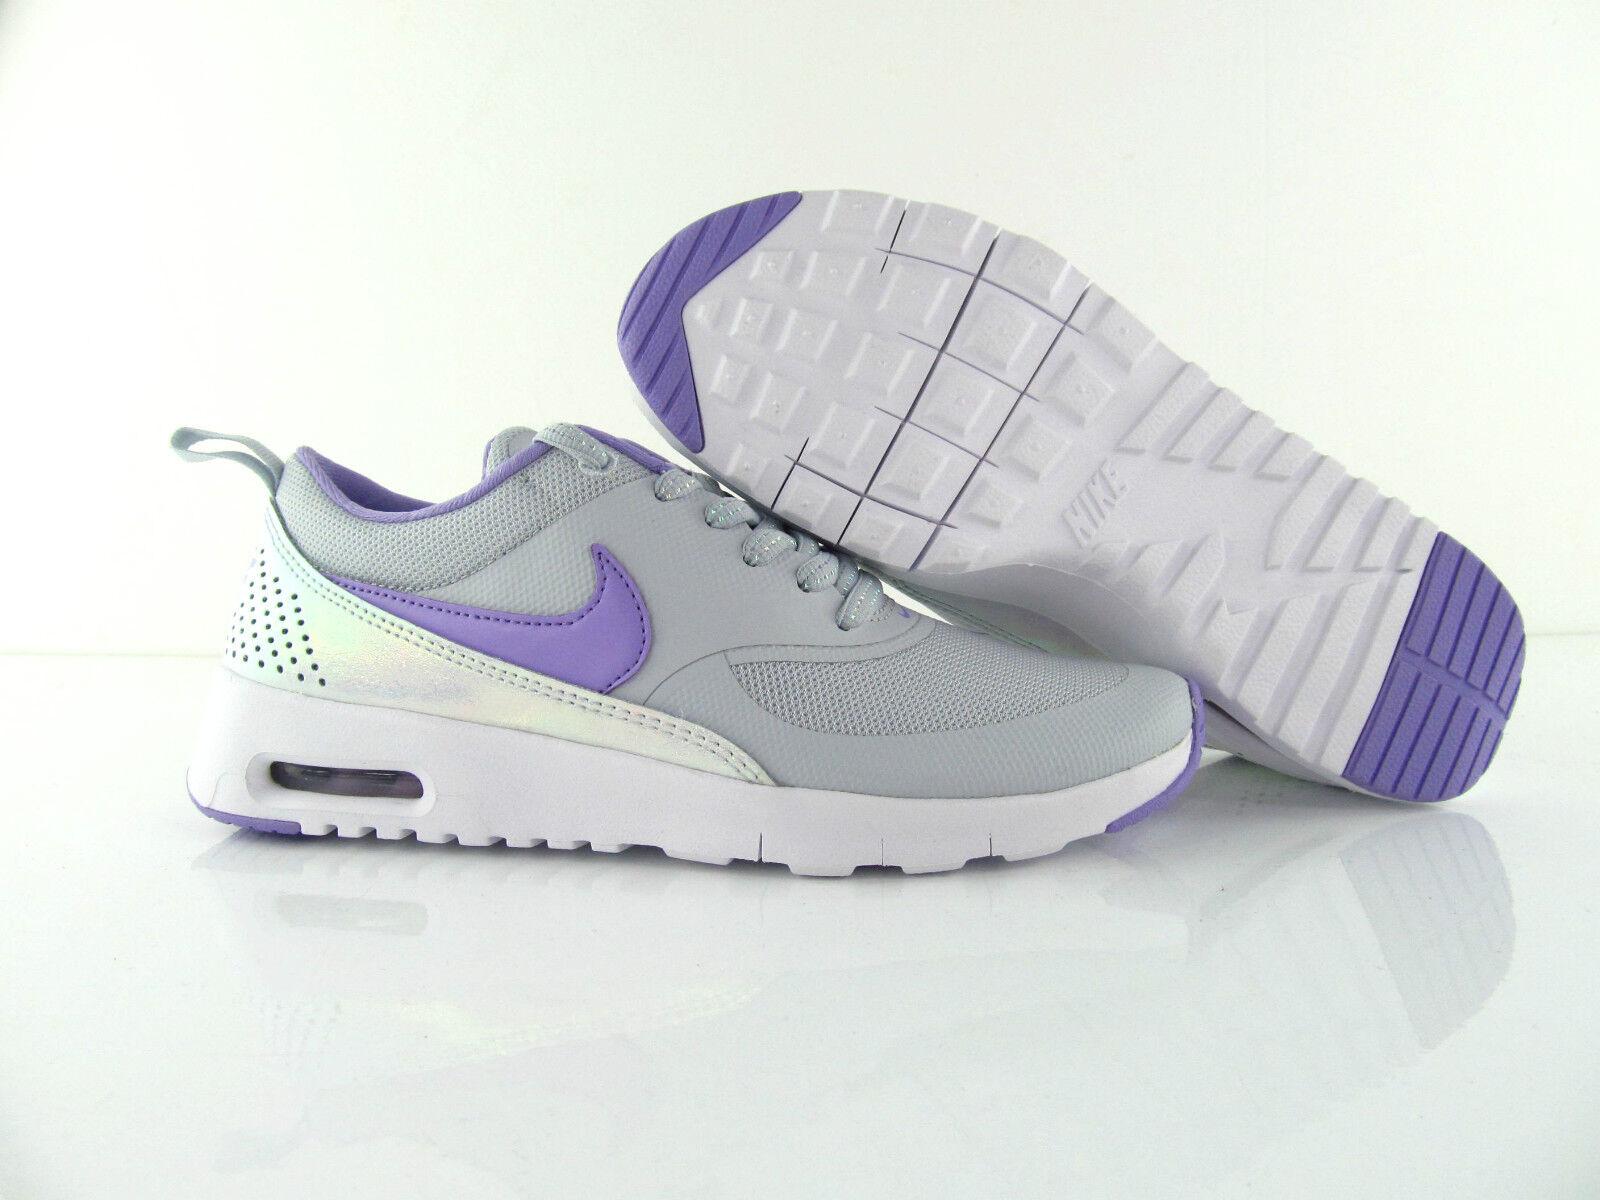 Nike Air mAx Thea SE Iridiscent Purple New UK_4 UK_4 UK_4 Eur 36.5 da3e20